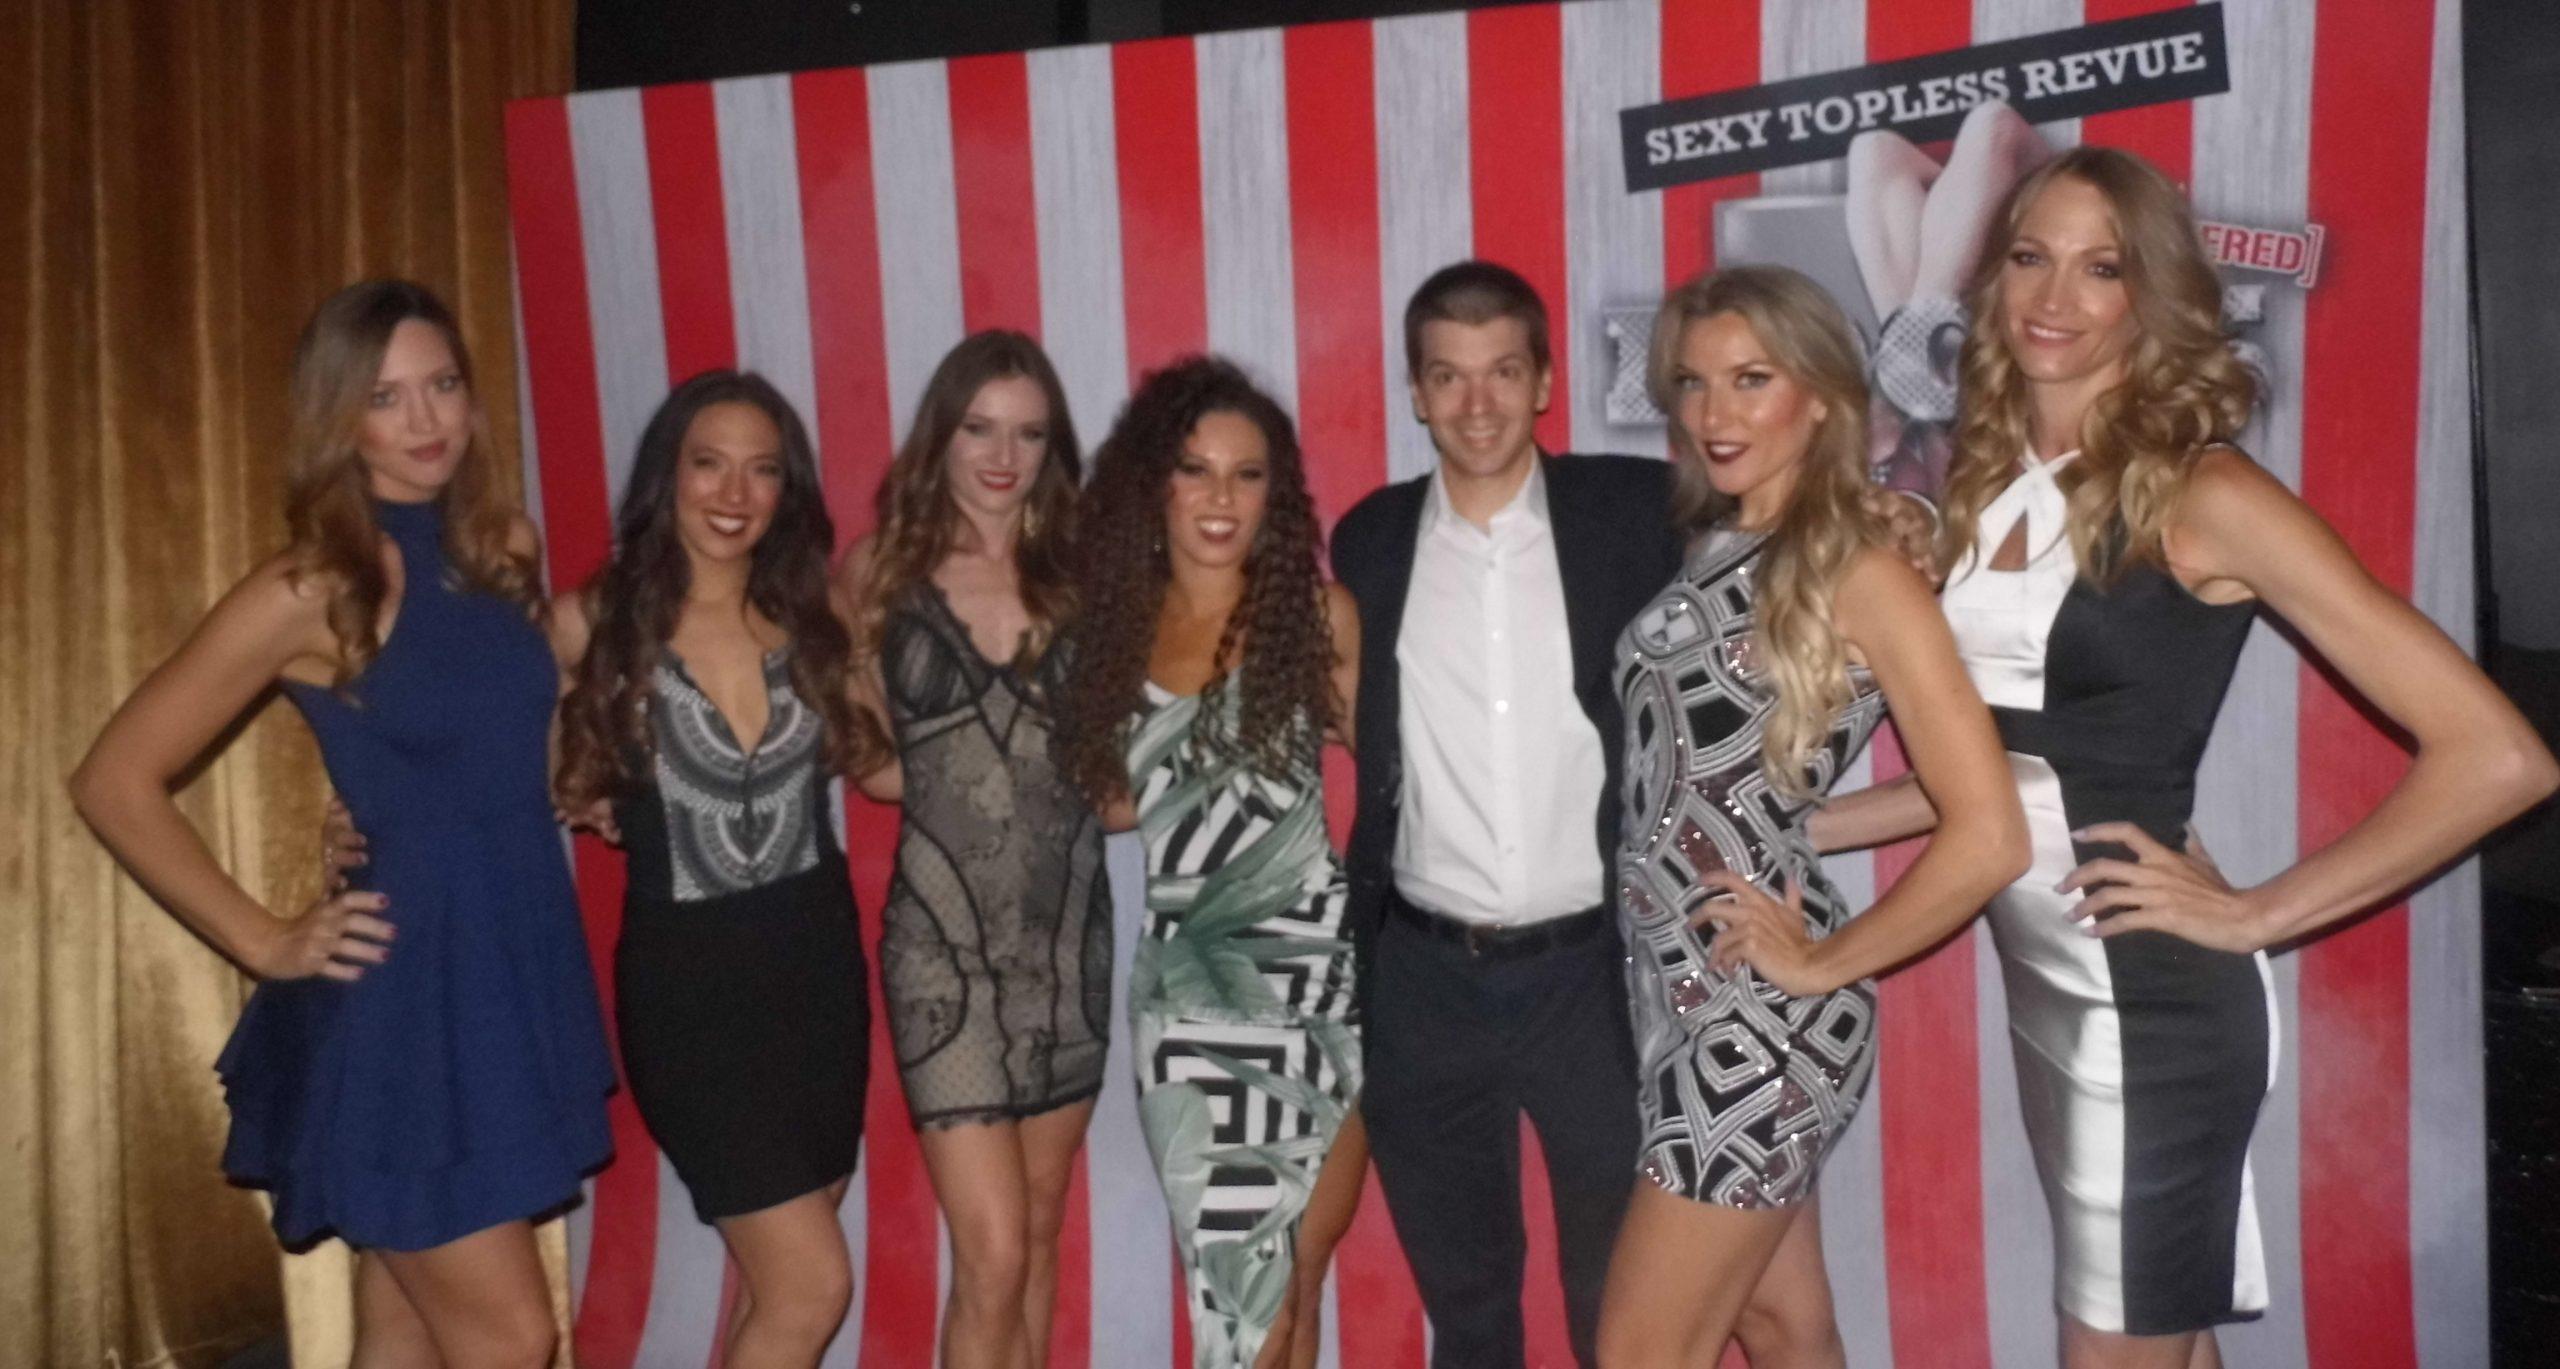 Chris Yandek, Las Vegas, X Rocks Las Vegas, X Rocks Topless Revue, X Rocks Bally's Las Vegas, X Rocks Women, X Rocks Las Vegas Show